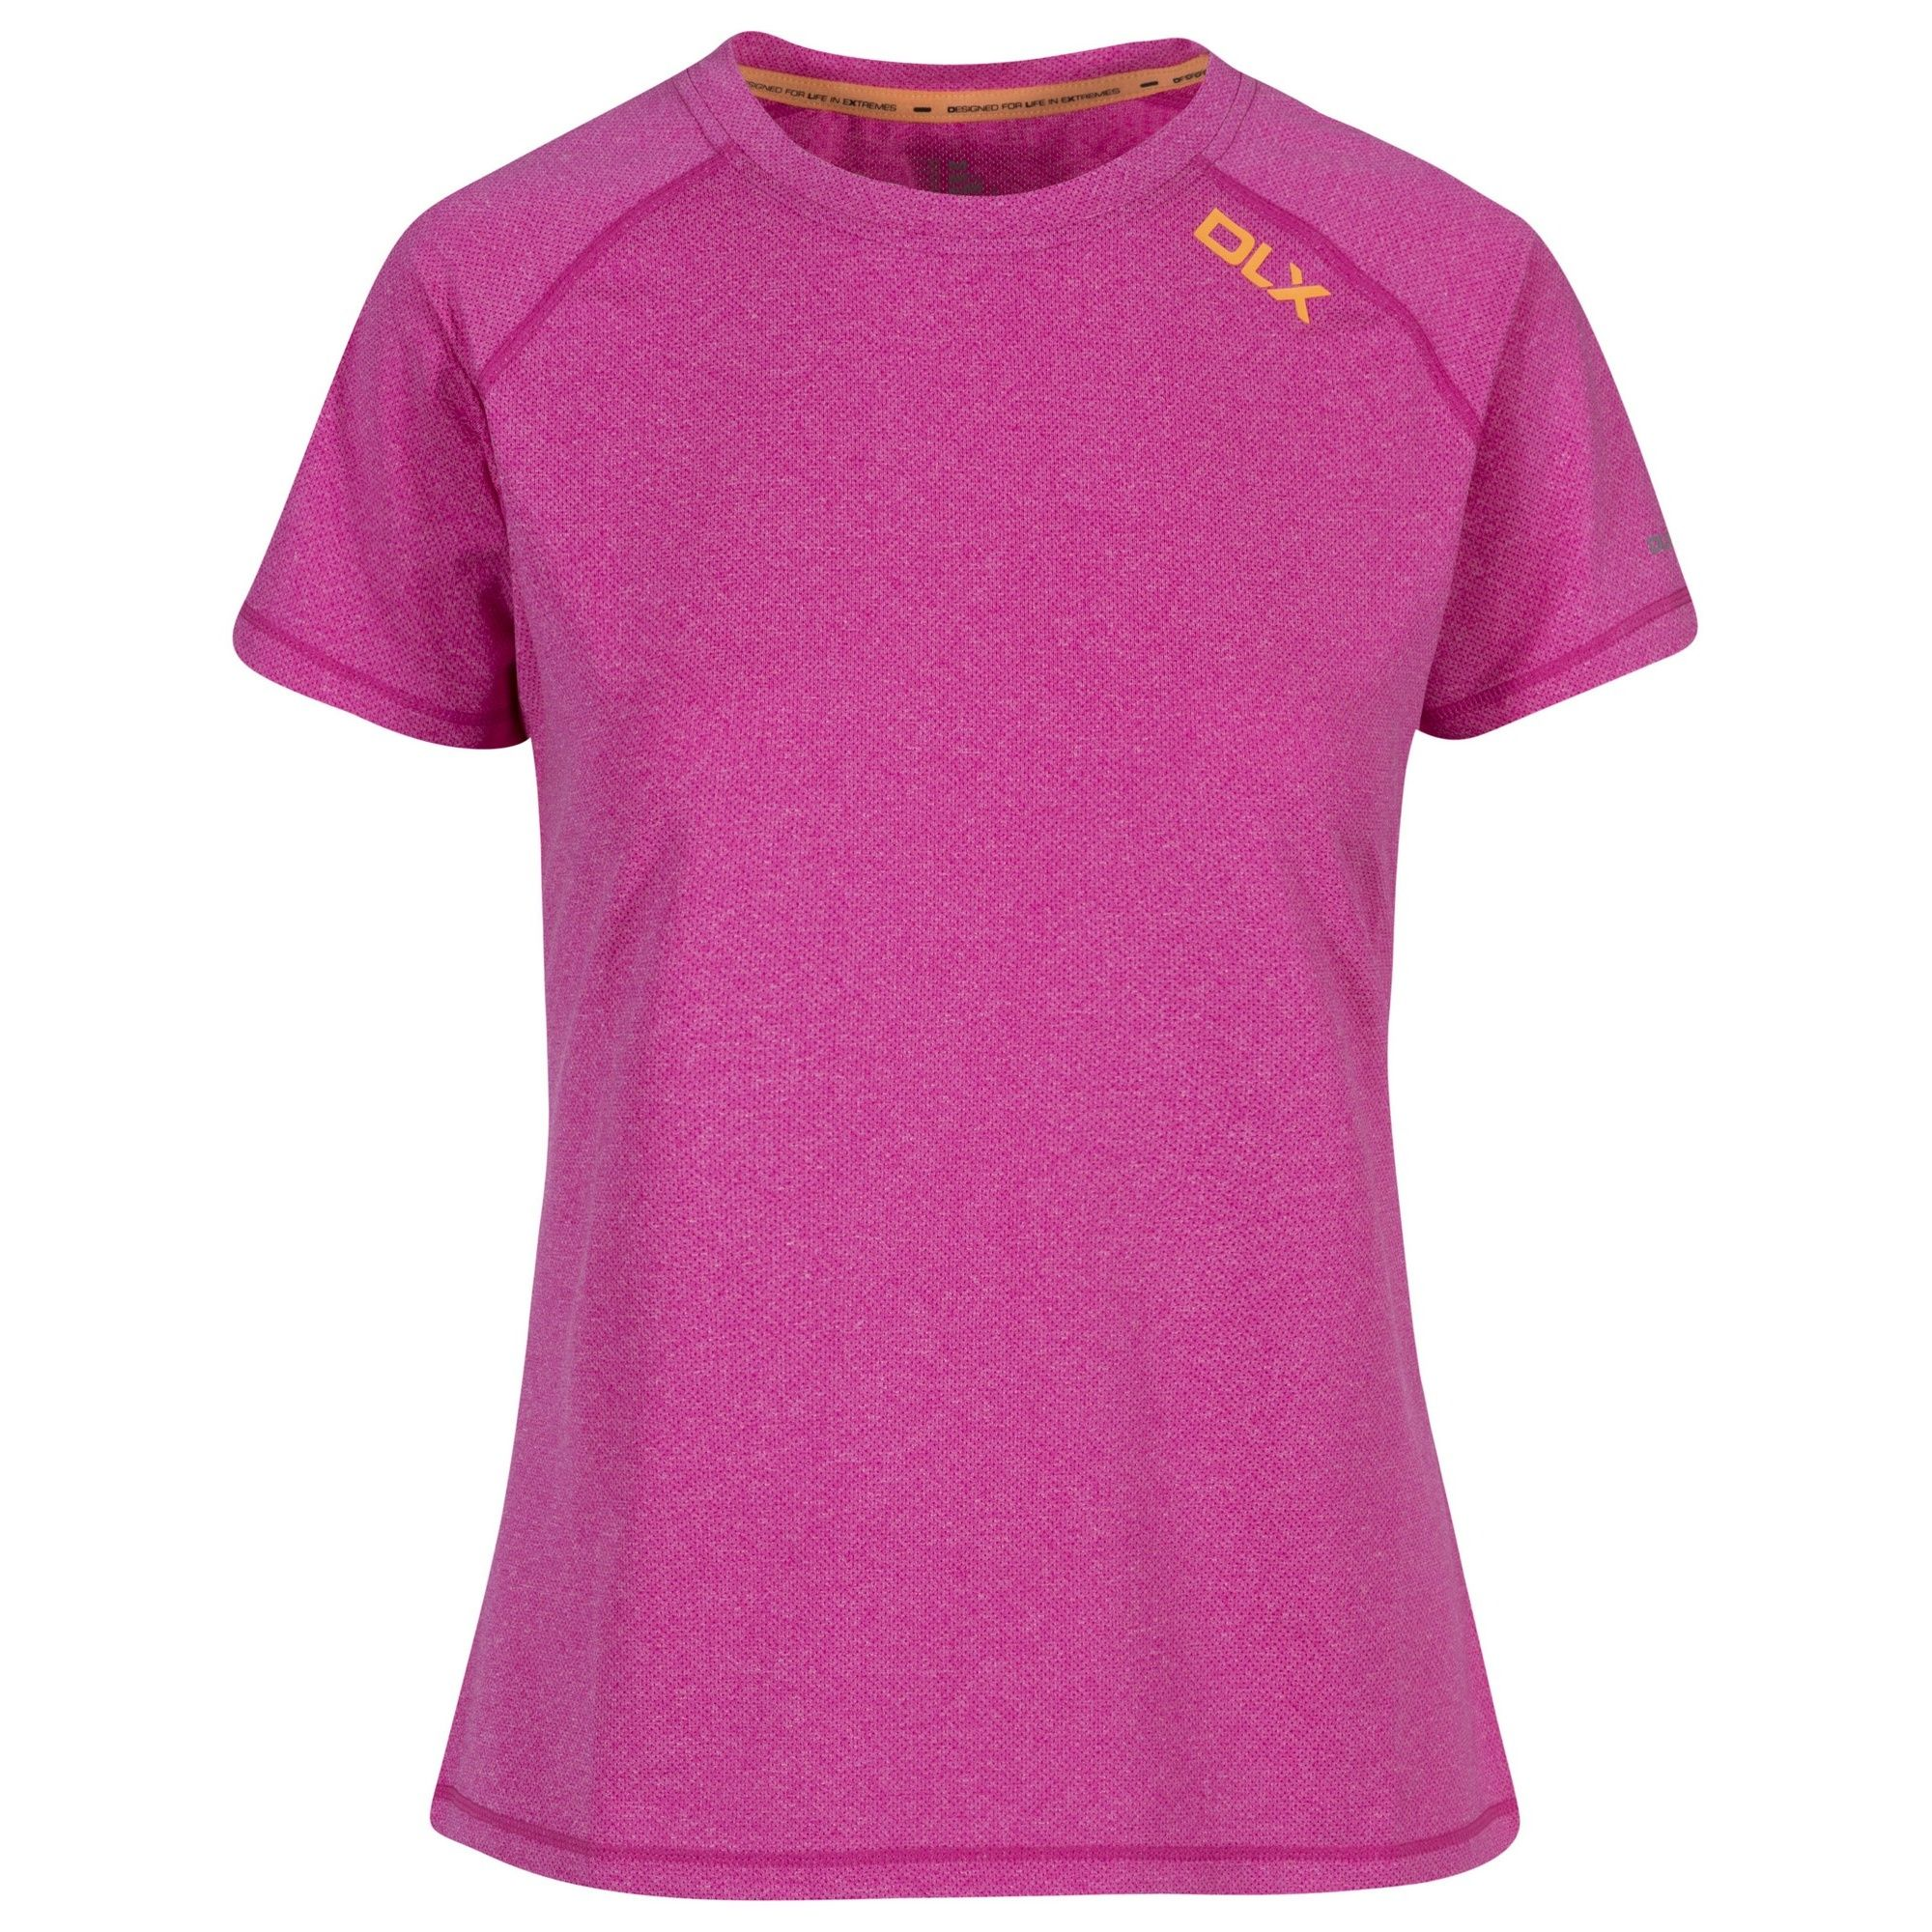 Trespass Womens/Ladies Monnae Sports T-Shirt